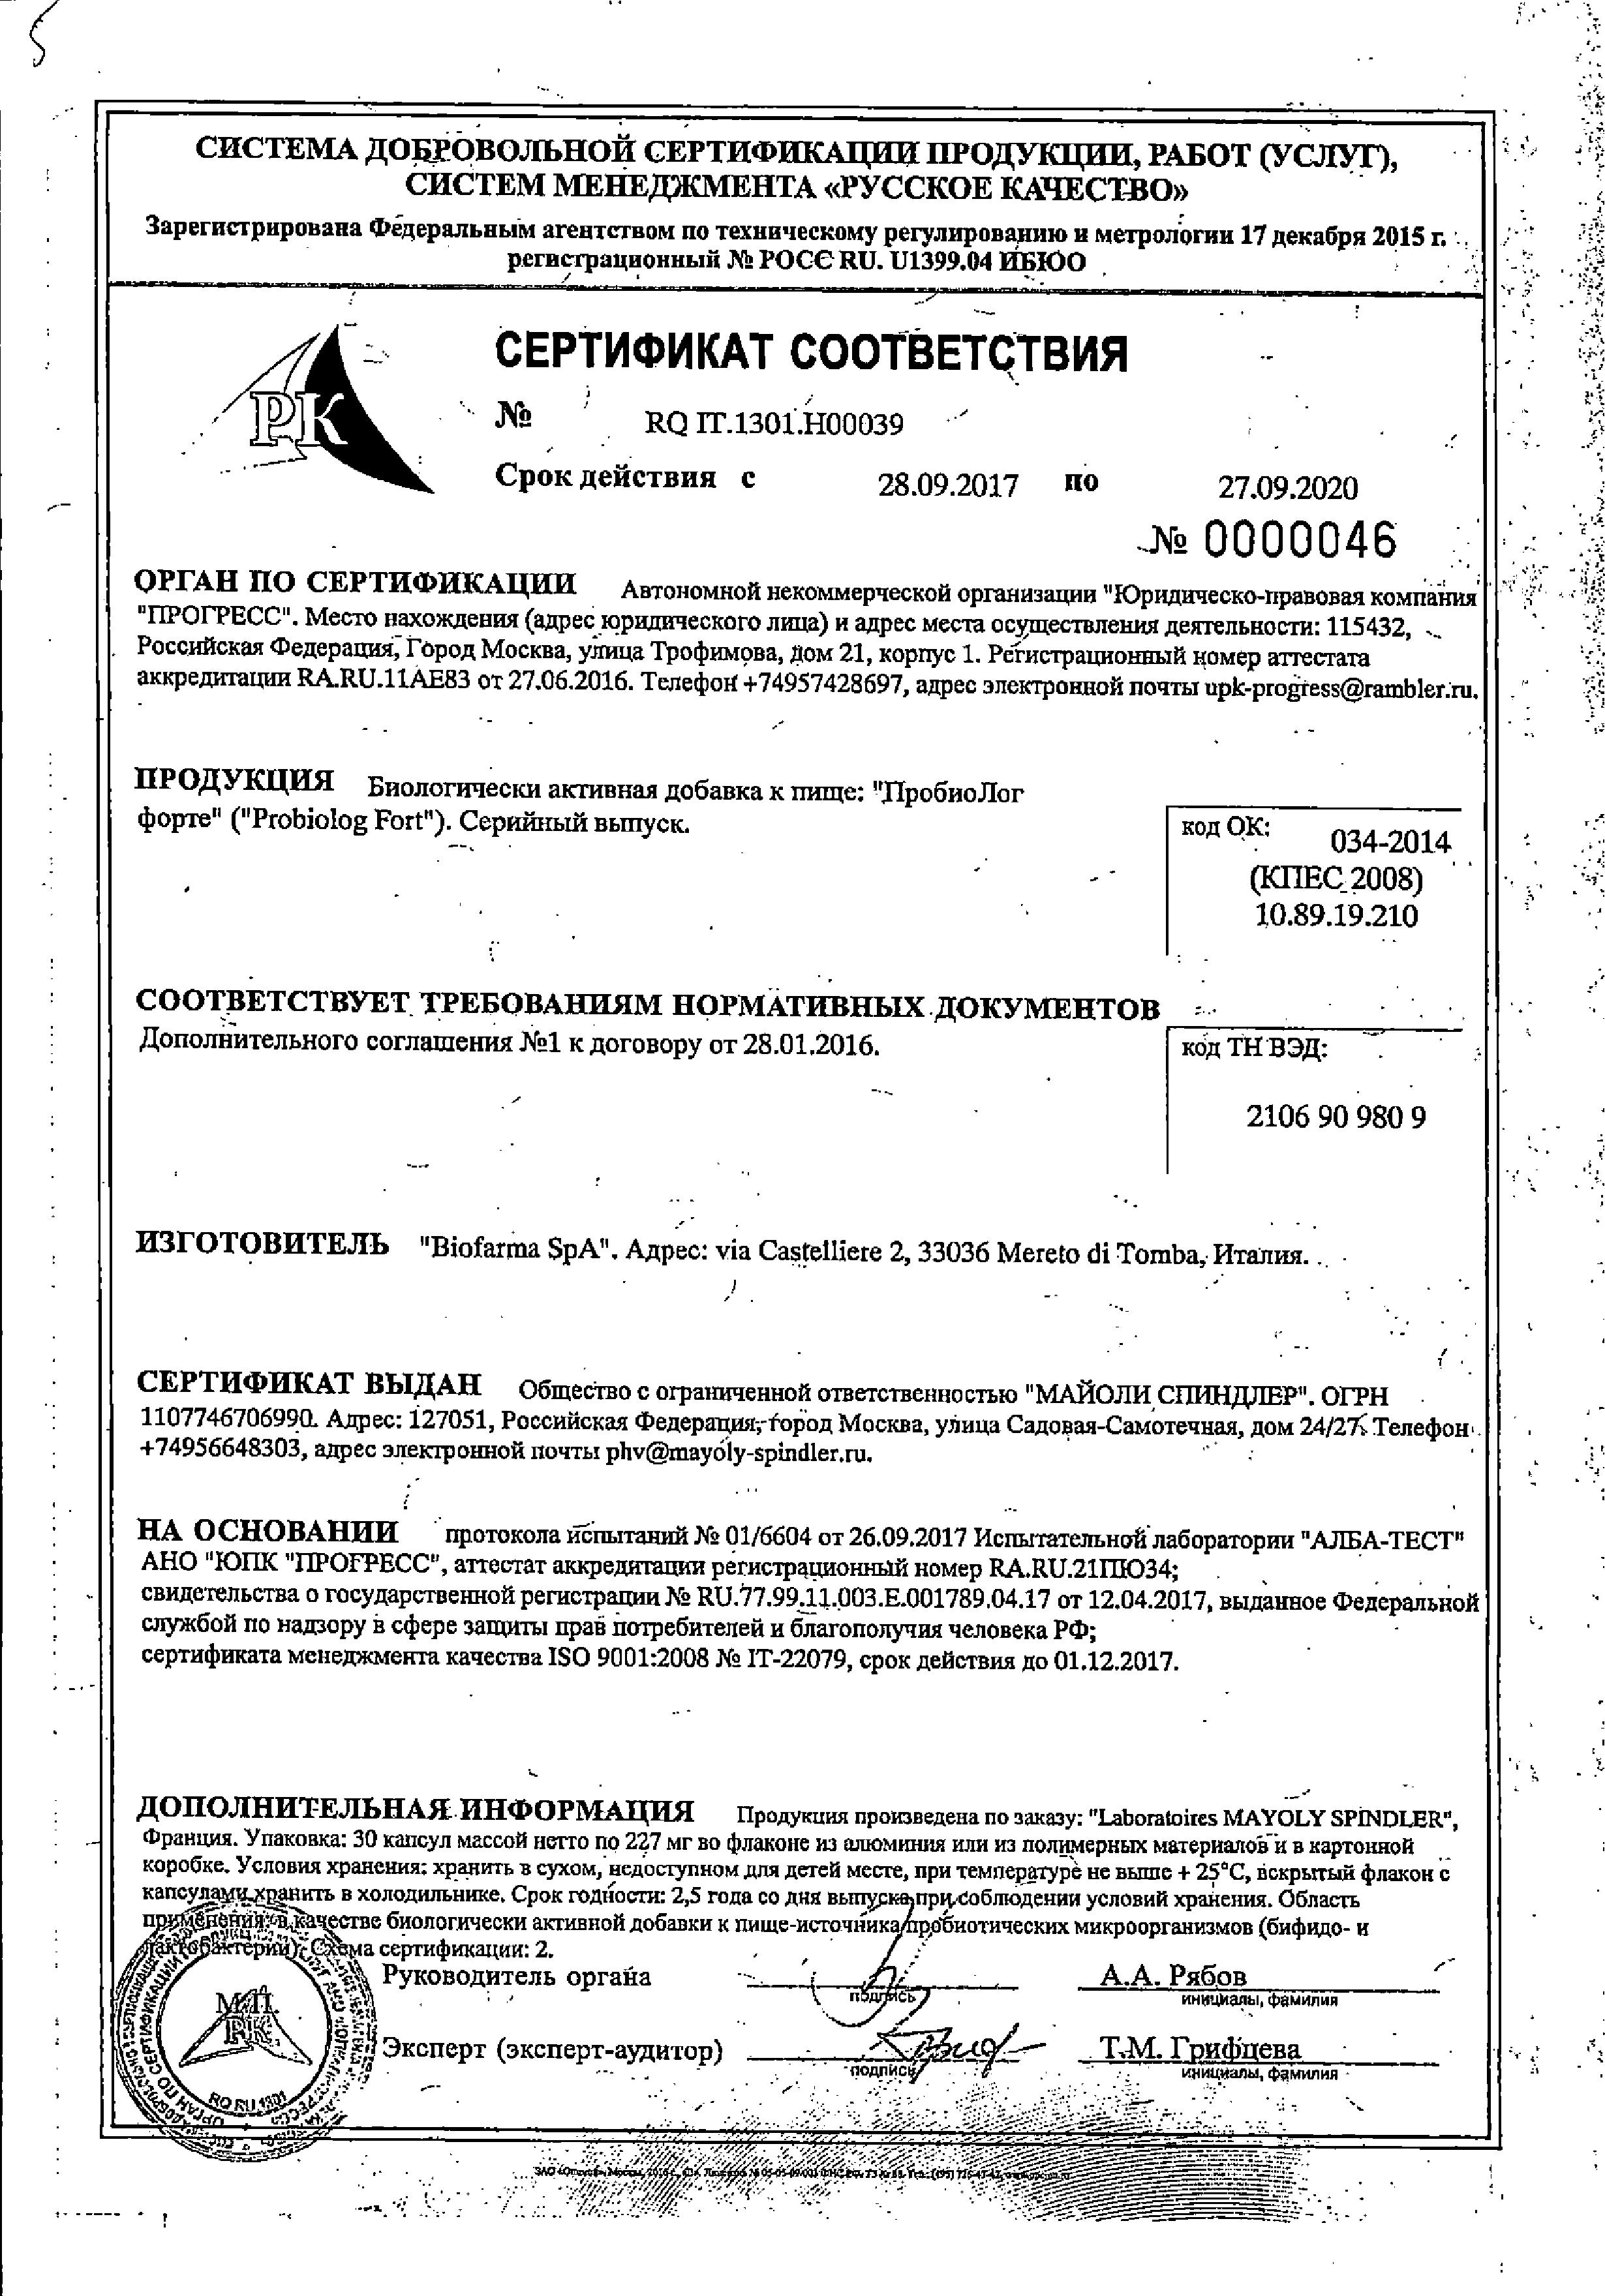 ПробиоЛог Форте сертификат